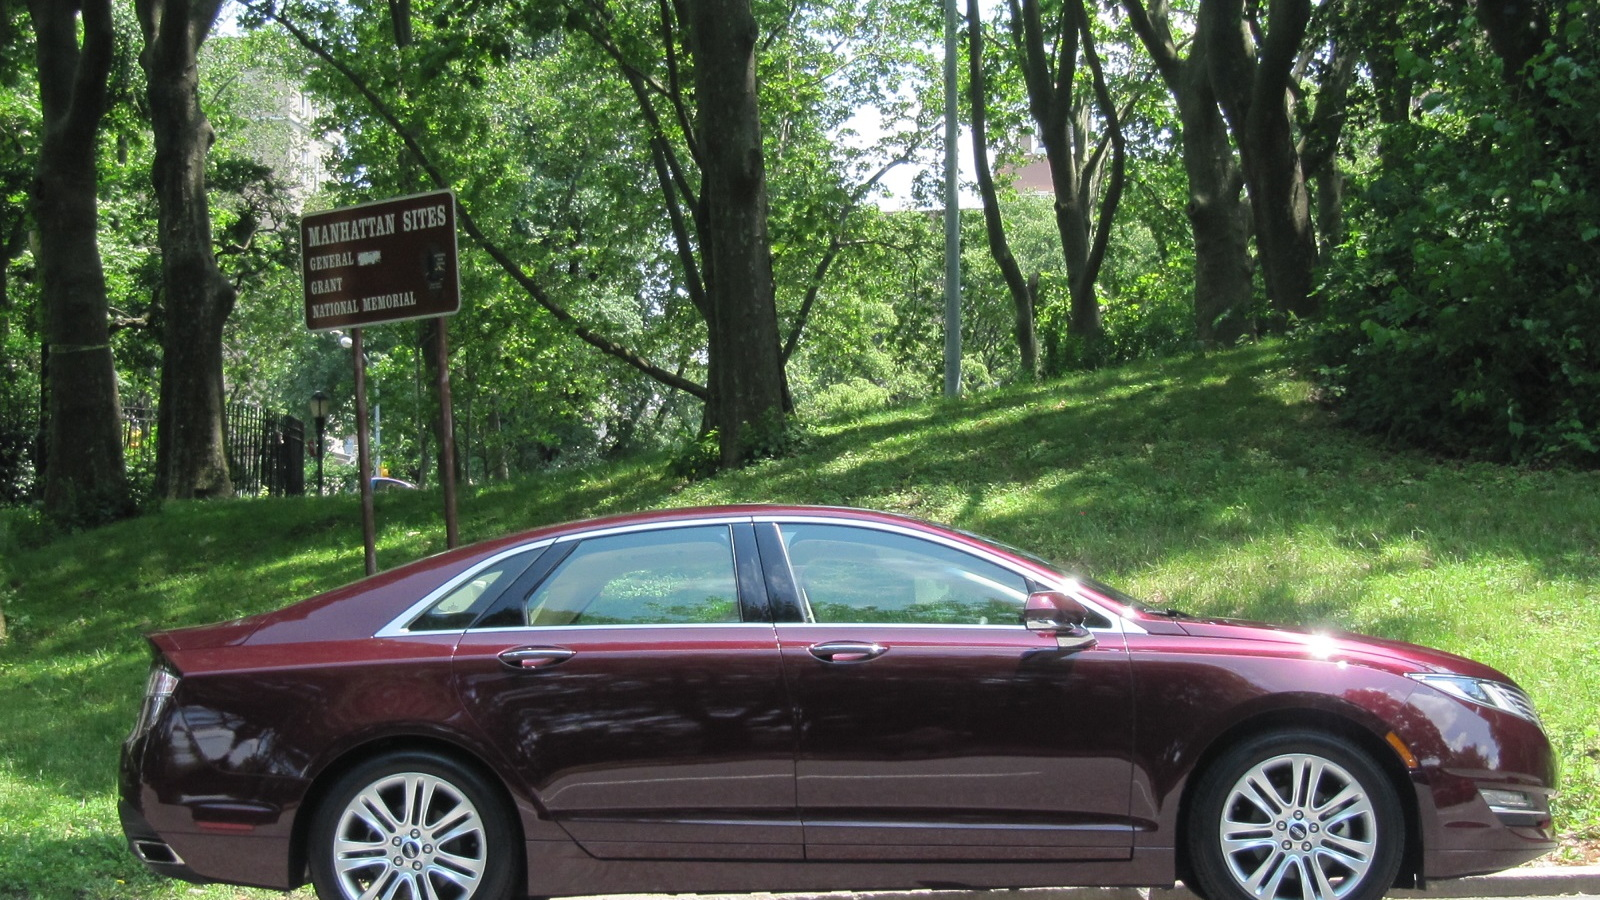 2013 Lincoln MKZ Hybrid, New York City, June 2013